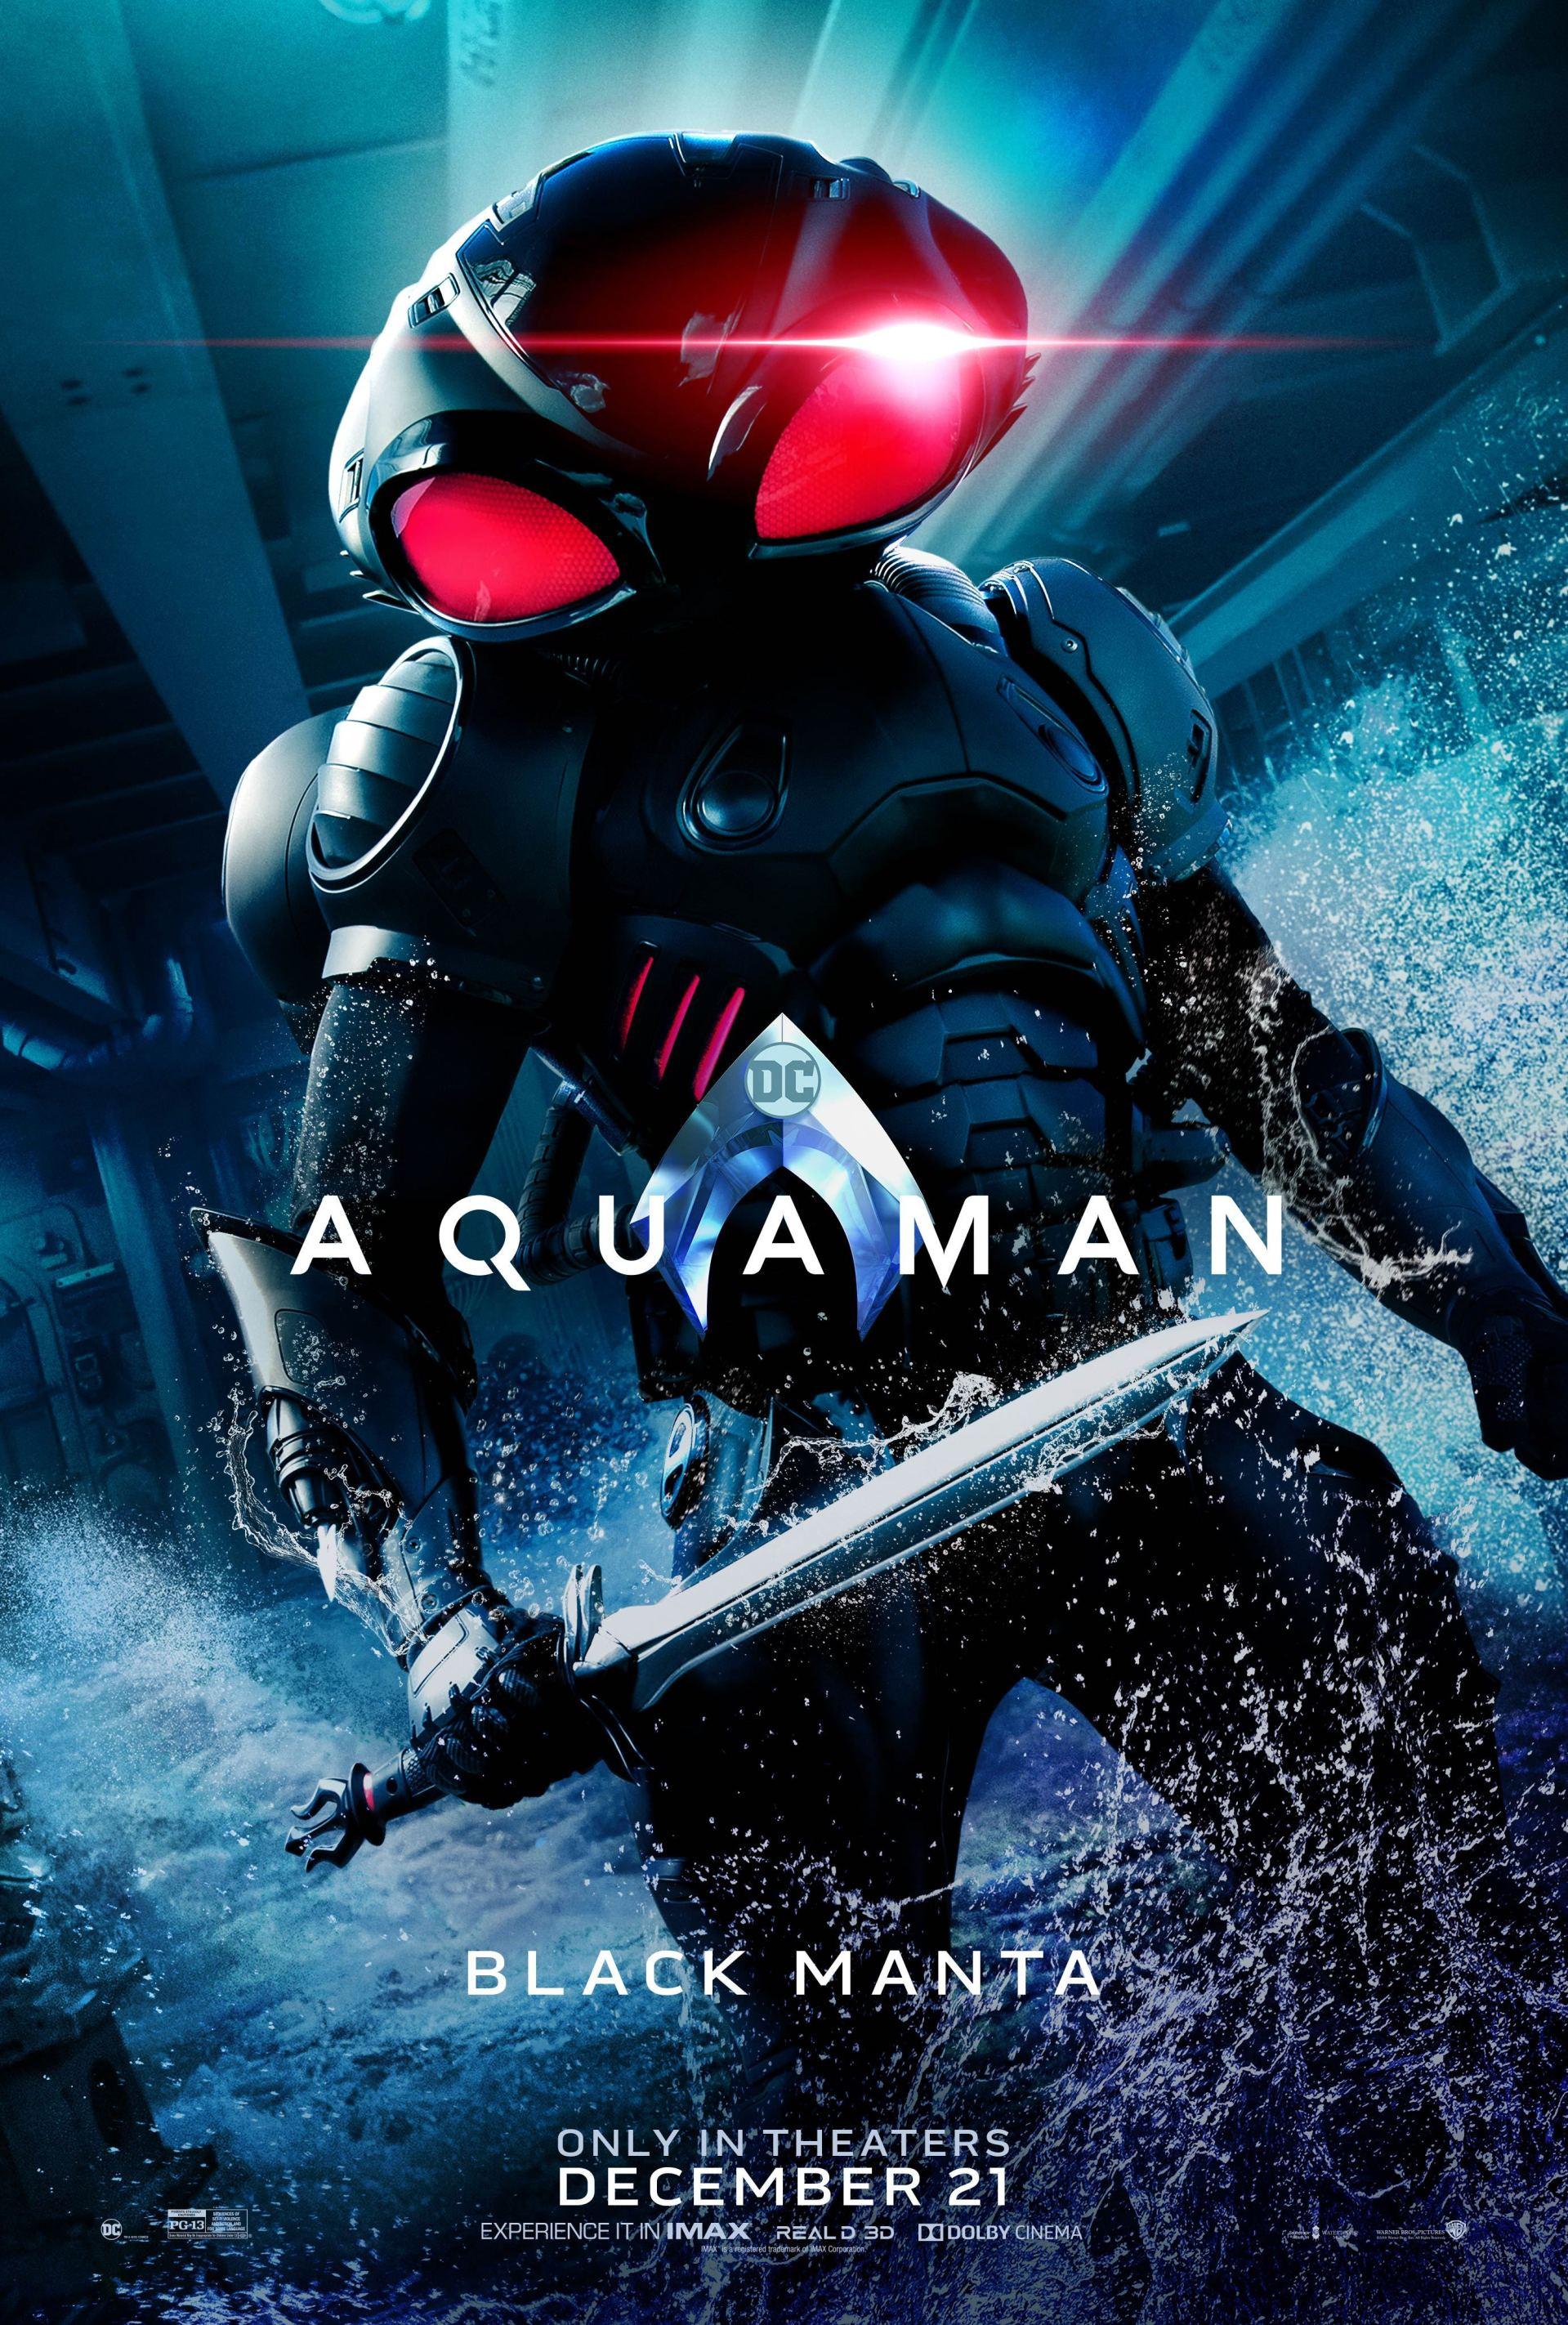 Aquaman-Chraracter-Posters-Black-Manta